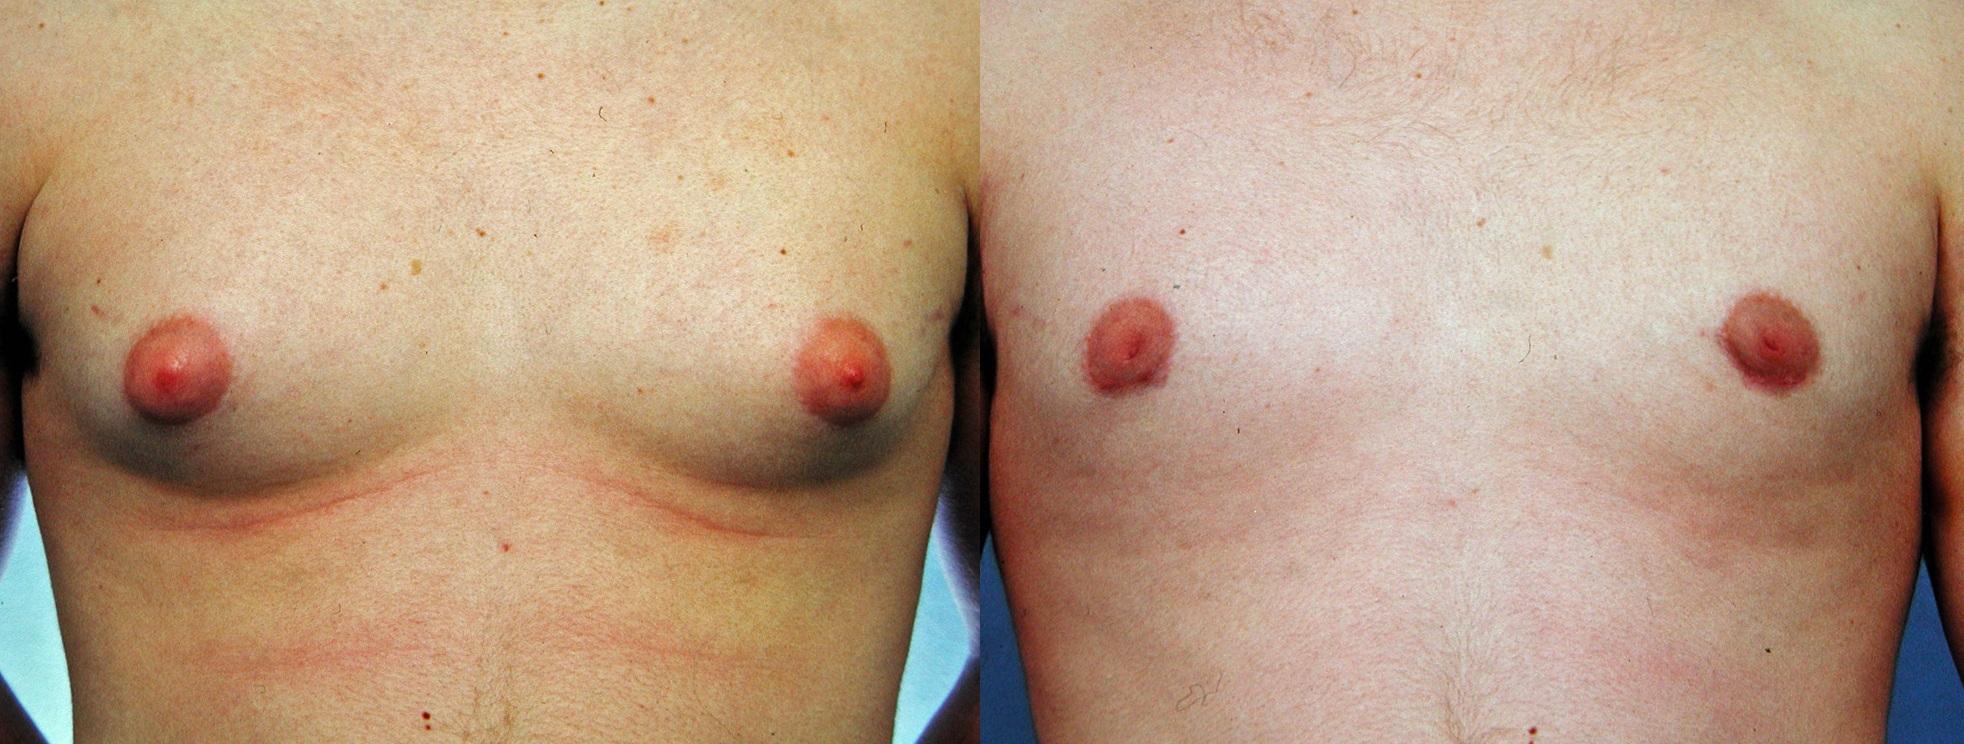 man-boobs-1 Vaser lipo cosmetic surgery clinic dublin 15